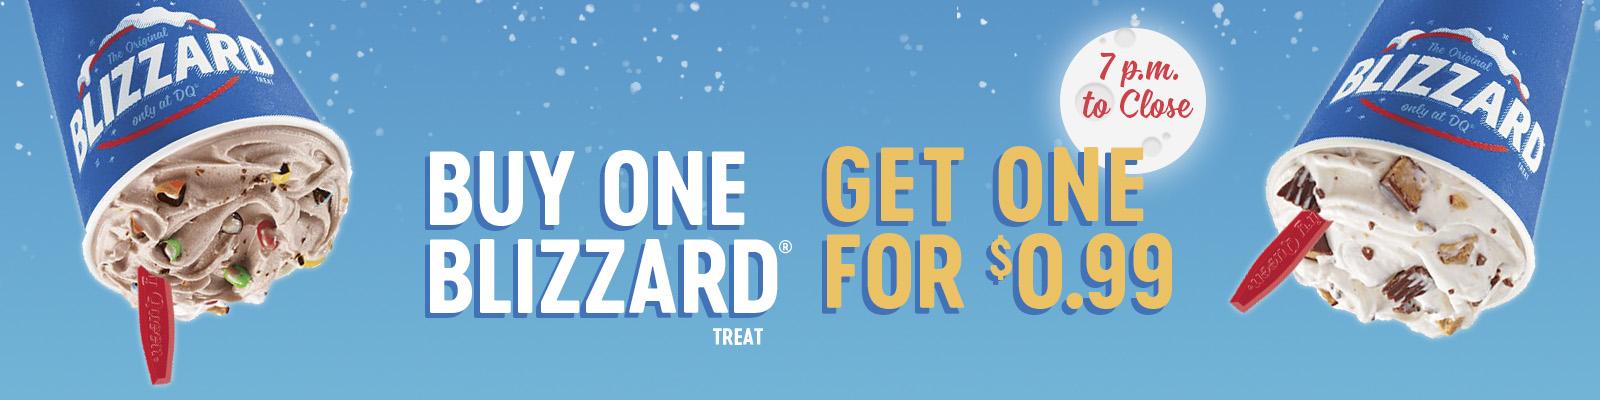 BOGO $0.99 Blizzard